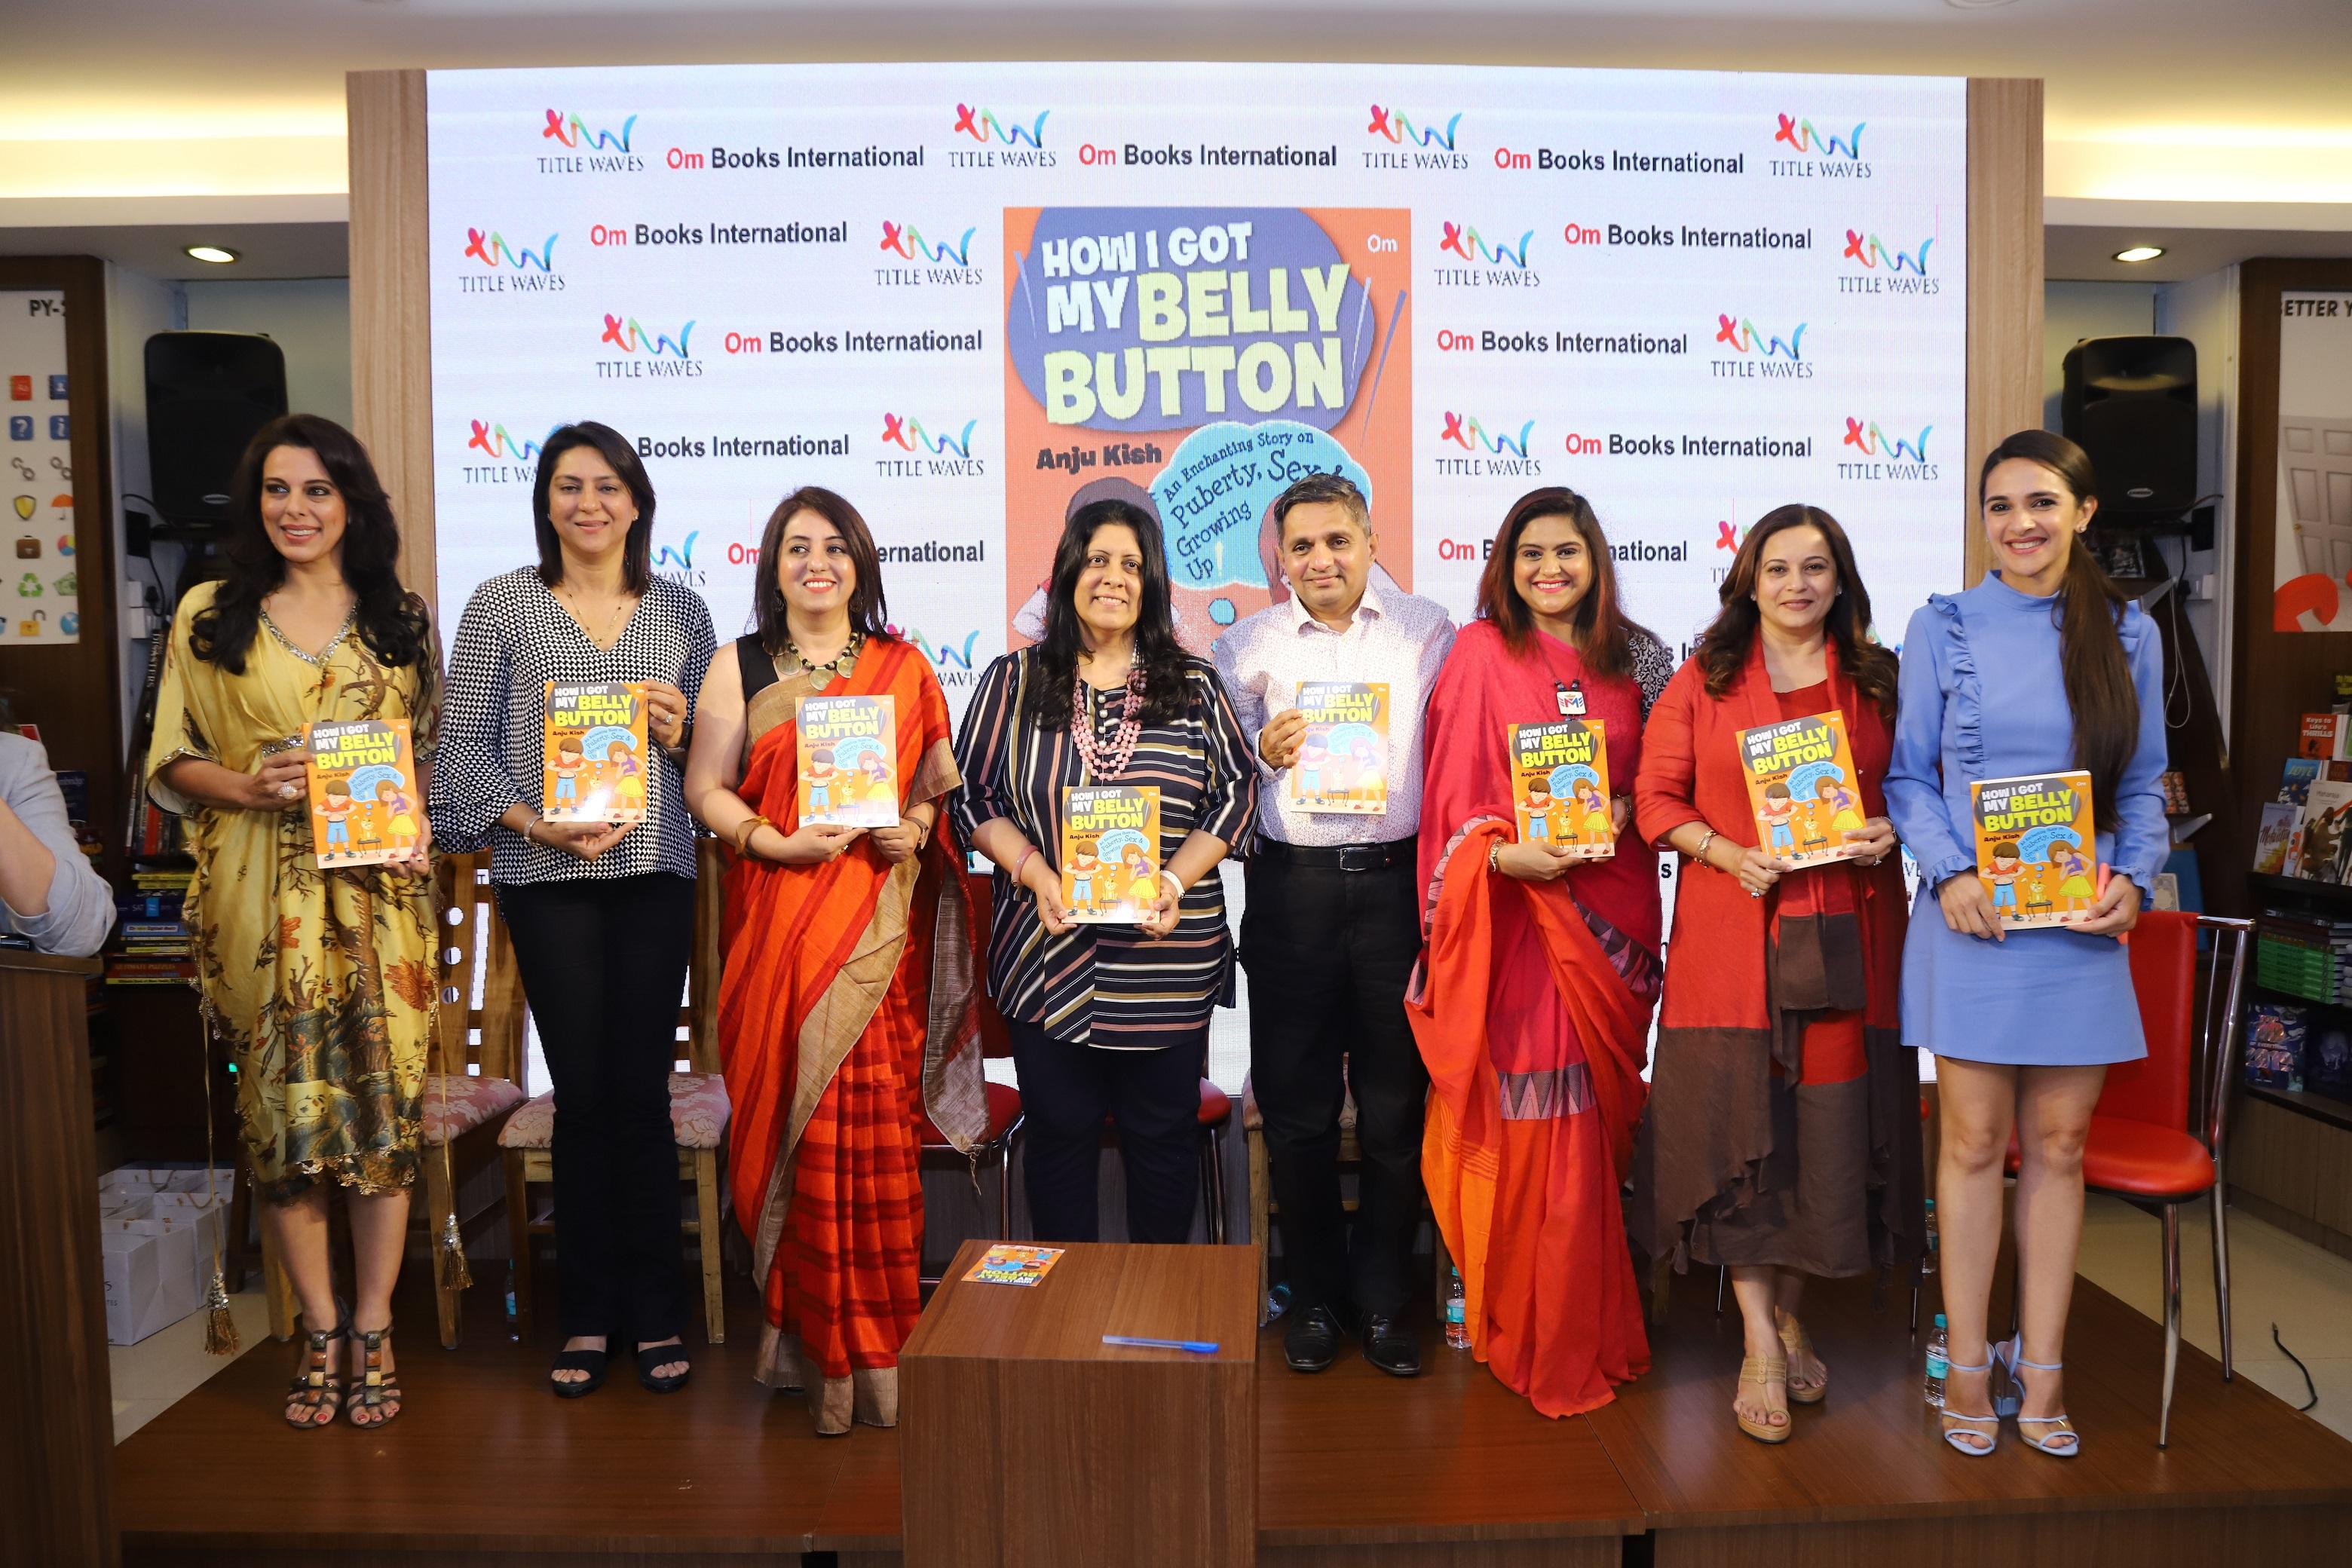 Pooja Bedi Priya Dutt Anju KishSwati PopatDr Harish ShettyNeha Kare Manasi Joshi Roy and Tara Sharma